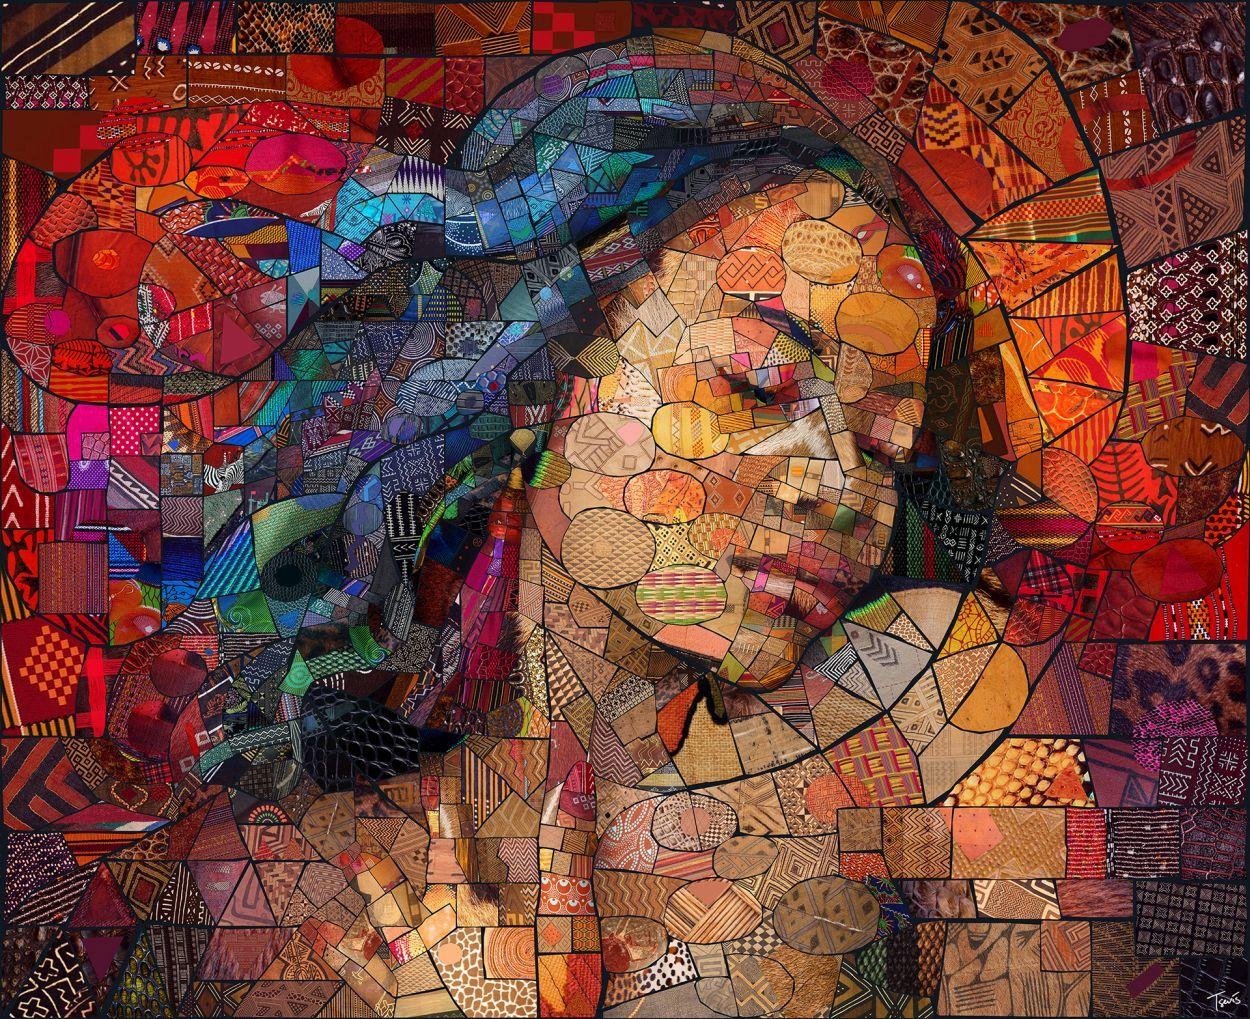 photoshop manipulation mosaic collage